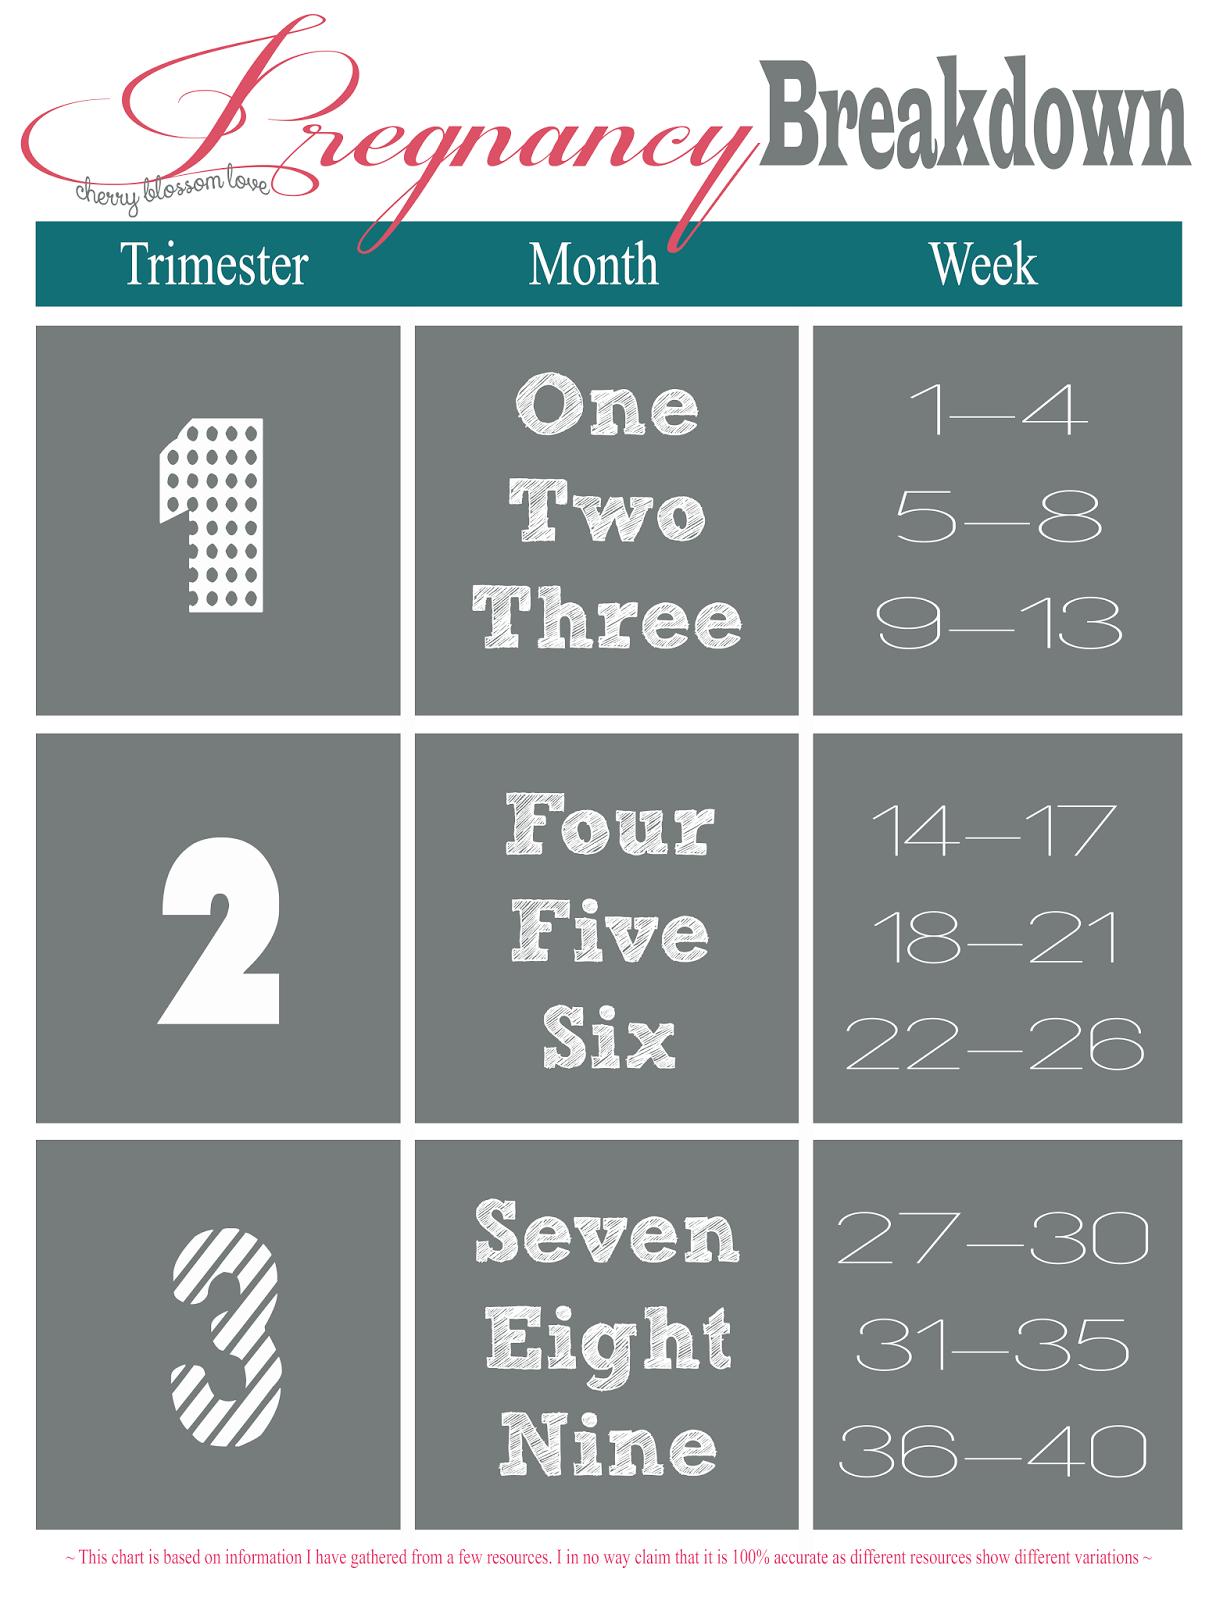 pregnancy breakdown in trimesters months and weeks  [ 1216 x 1600 Pixel ]